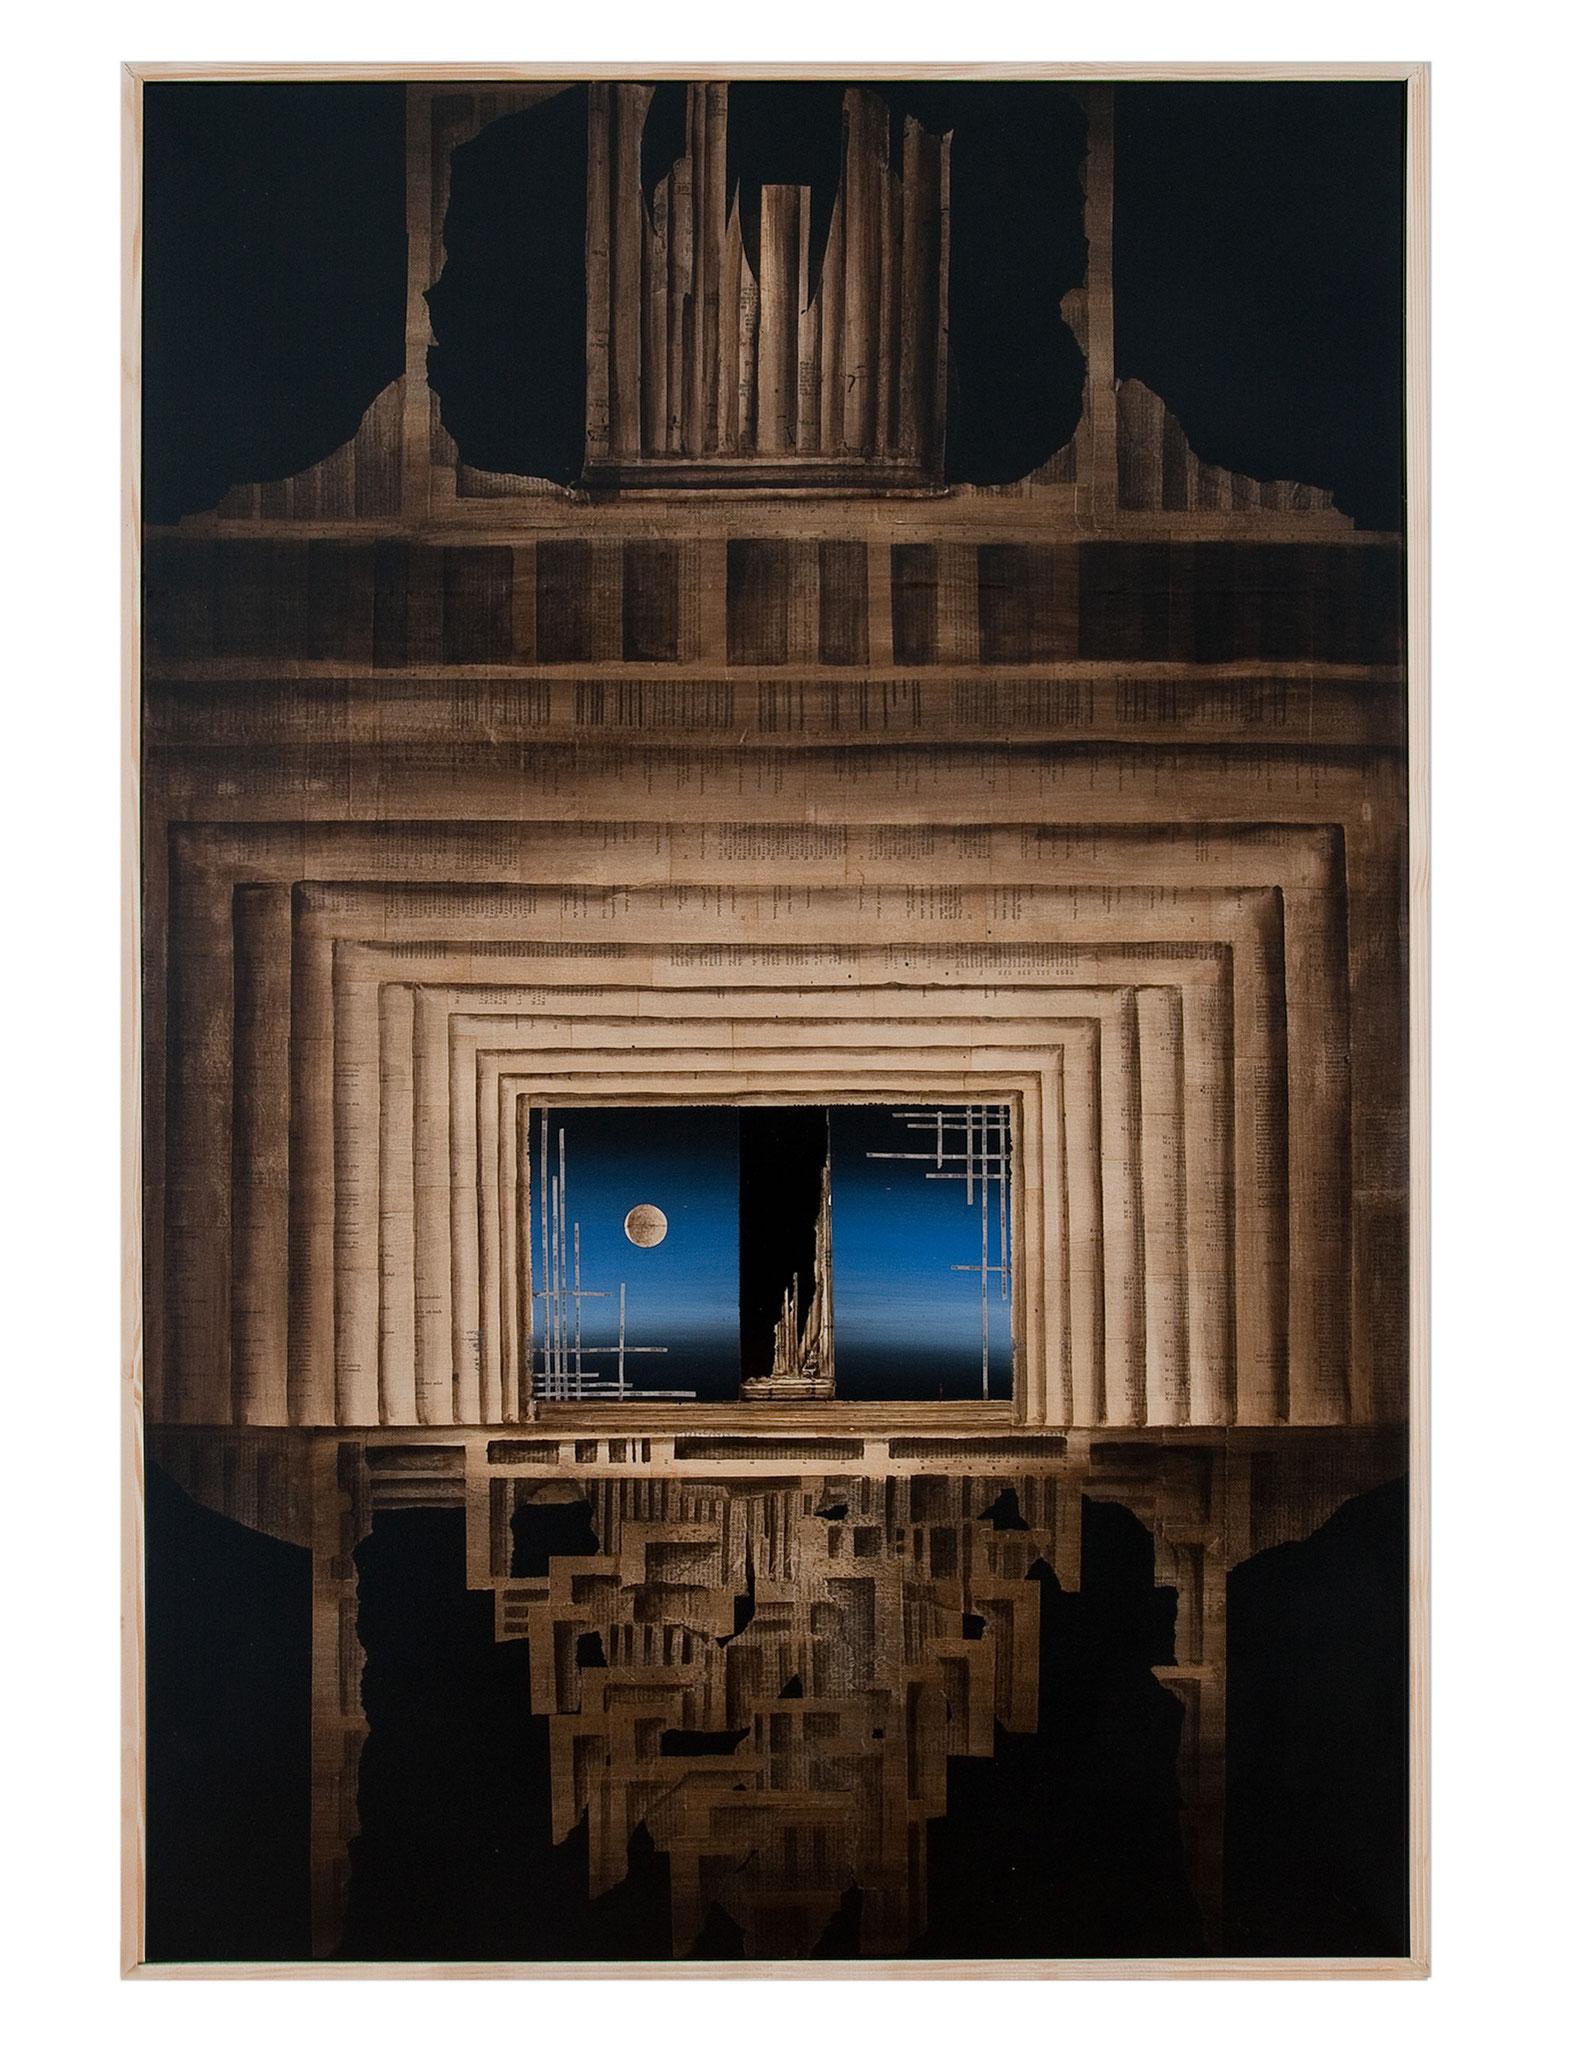 GOETHEDÄMMERUNG - 2013 - Acryl, Tusche, Papier - 124 x85 cm